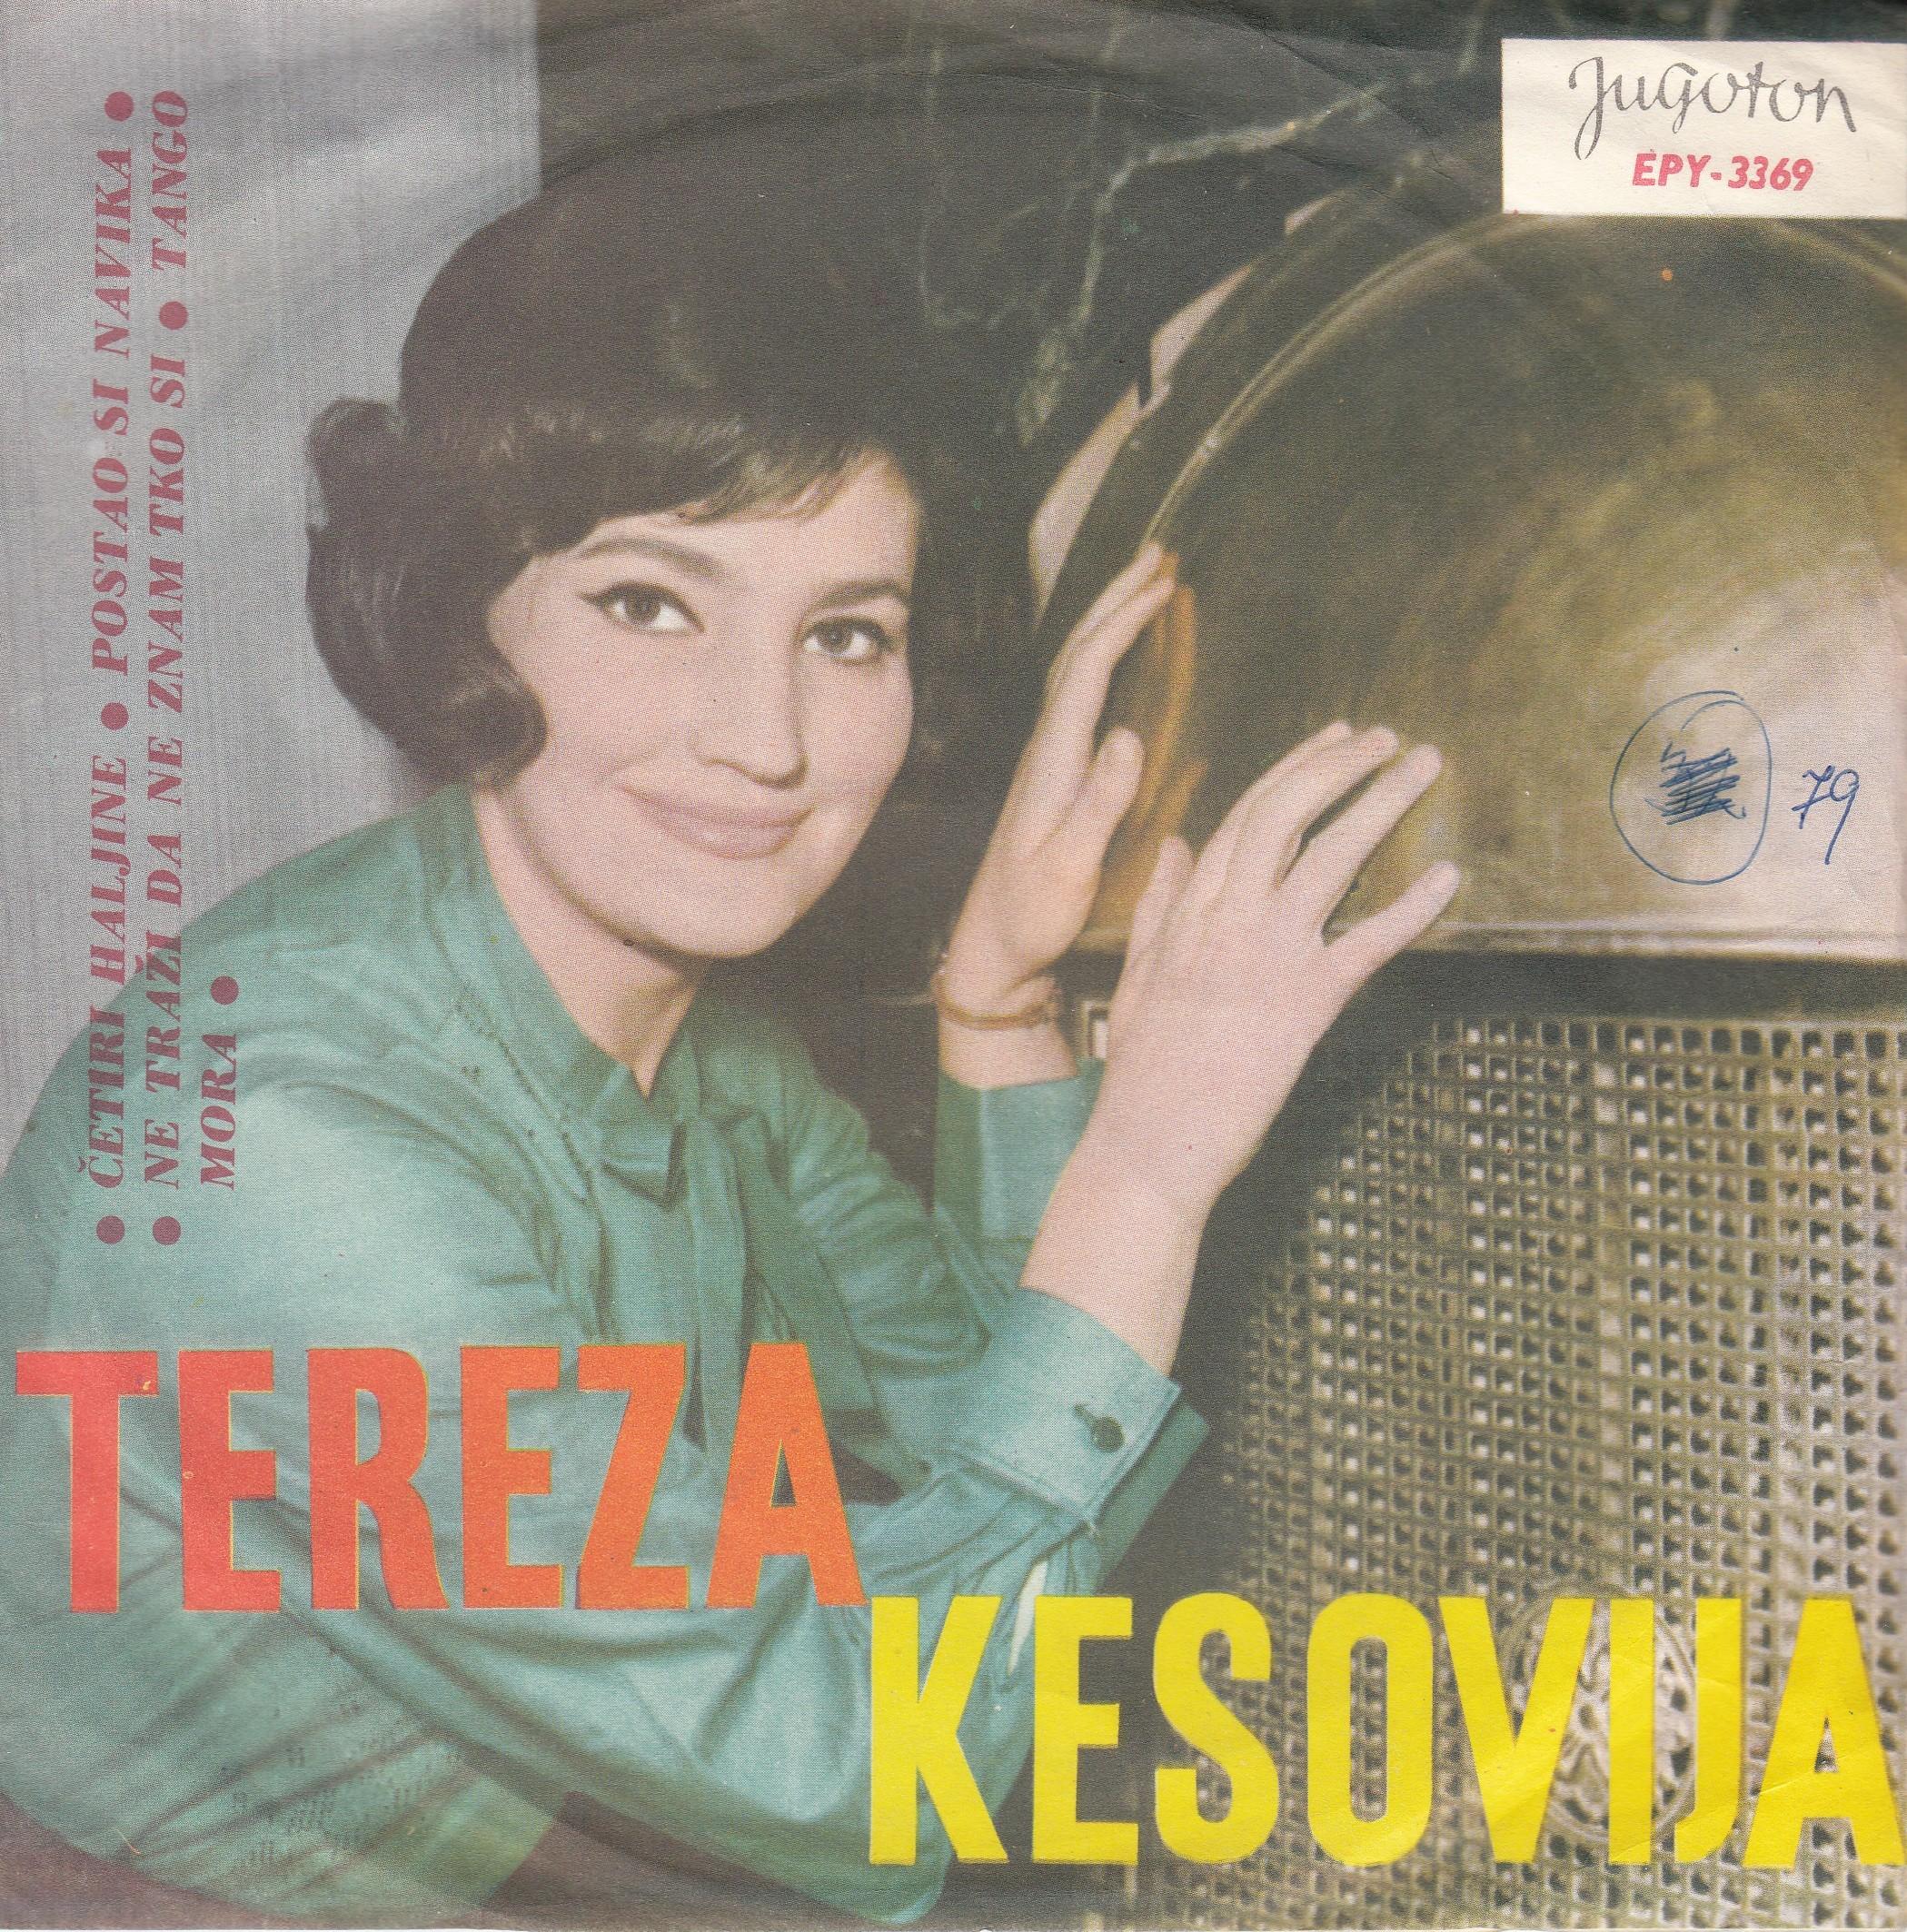 Kesovija Tereza - Cetiri Haljine/postao Si Navika/ne Trazi Da Ne Znam Tko Si/tango Mora